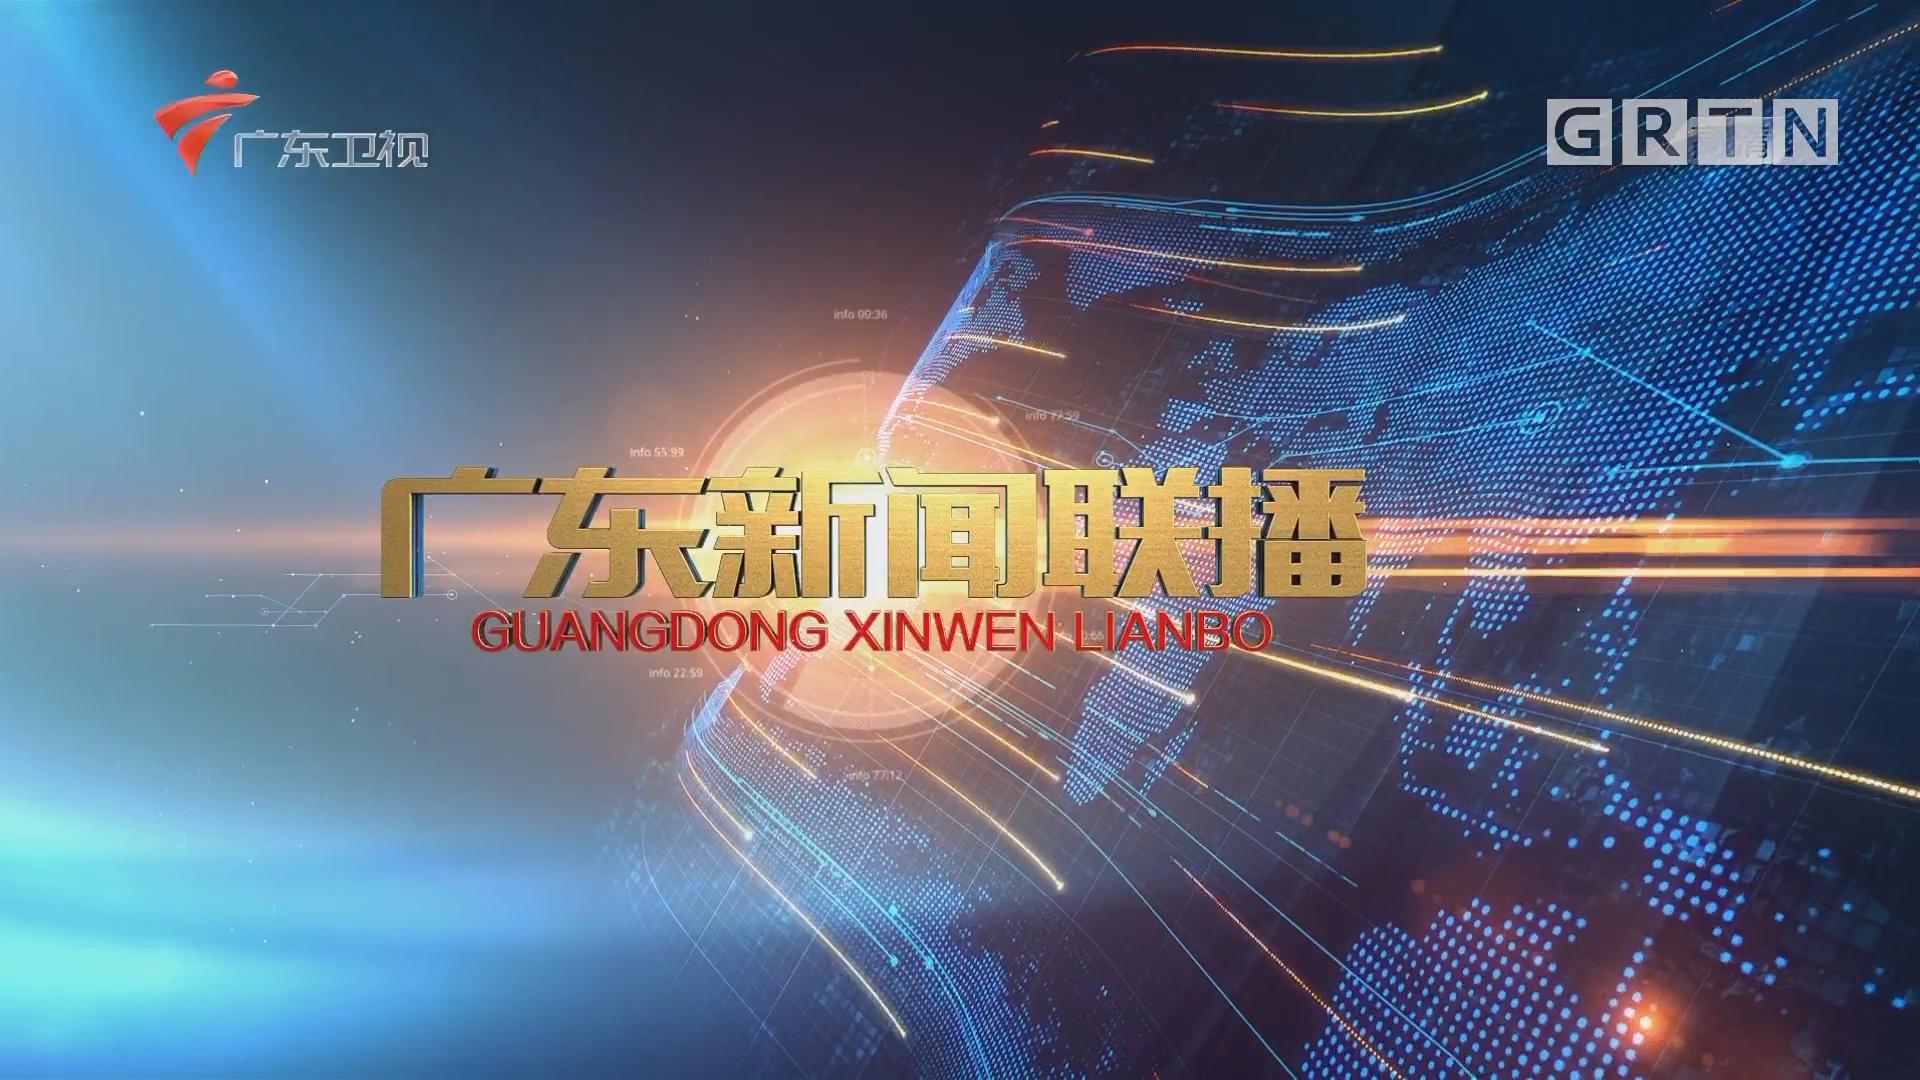 [HD][2018-05-20]广东新闻联播:广州:国际航运中心建设再冲刺 深化国际强港战略